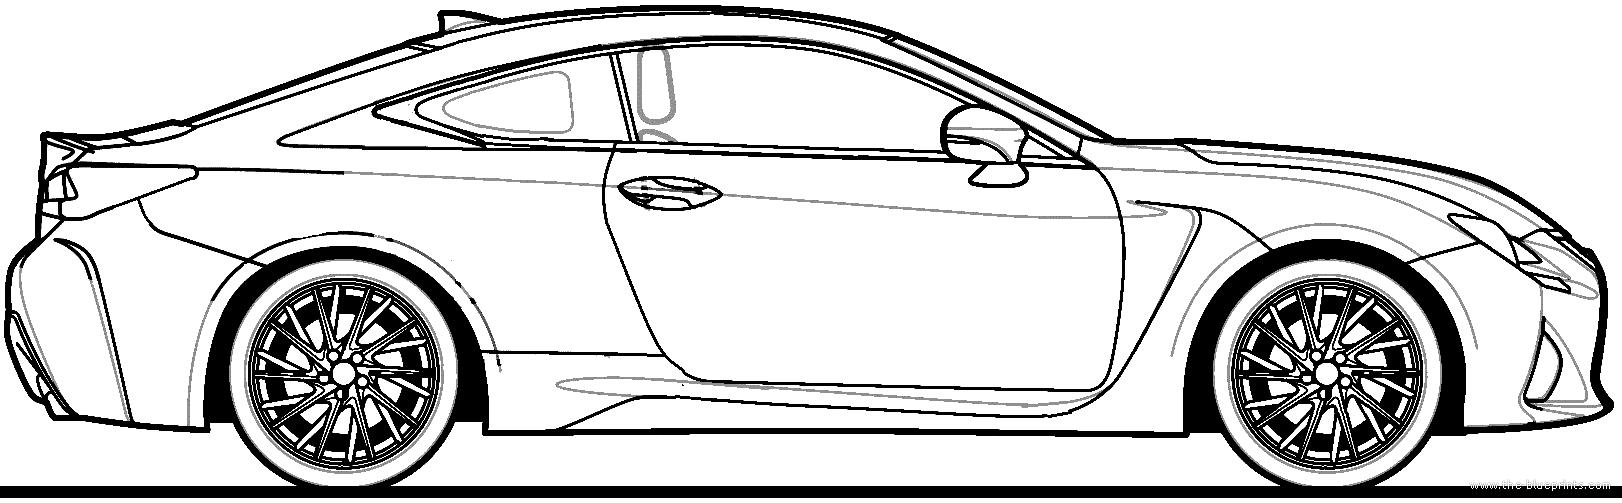 The blueprints blueprints cars lexus lexus rc f 2015 lexus rc f 2015 malvernweather Image collections